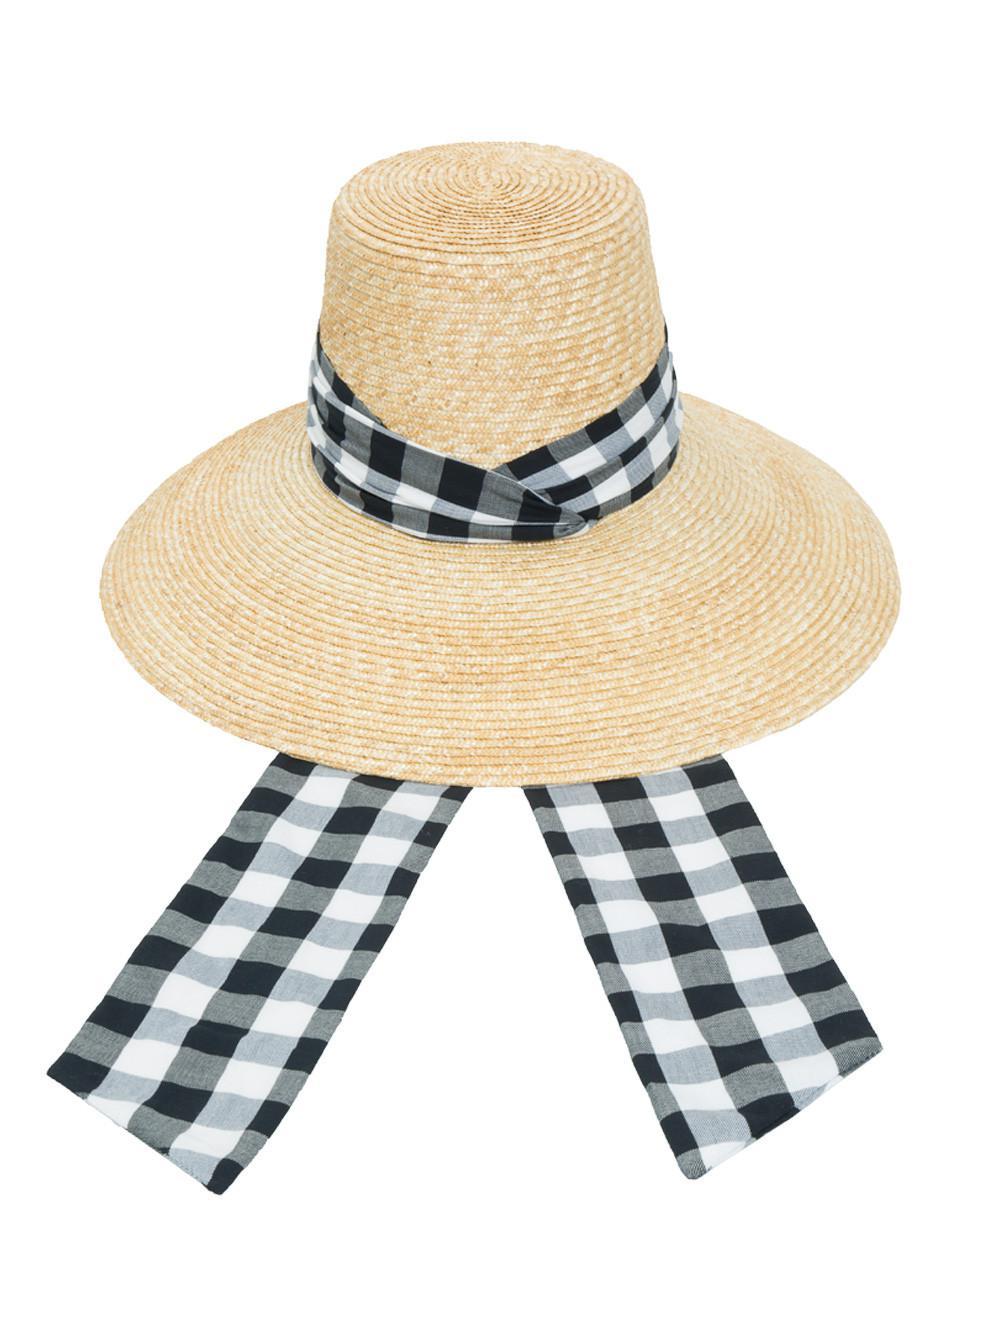 ae18d3e745b92 Lyst - Maison Michel Lhd X Hat